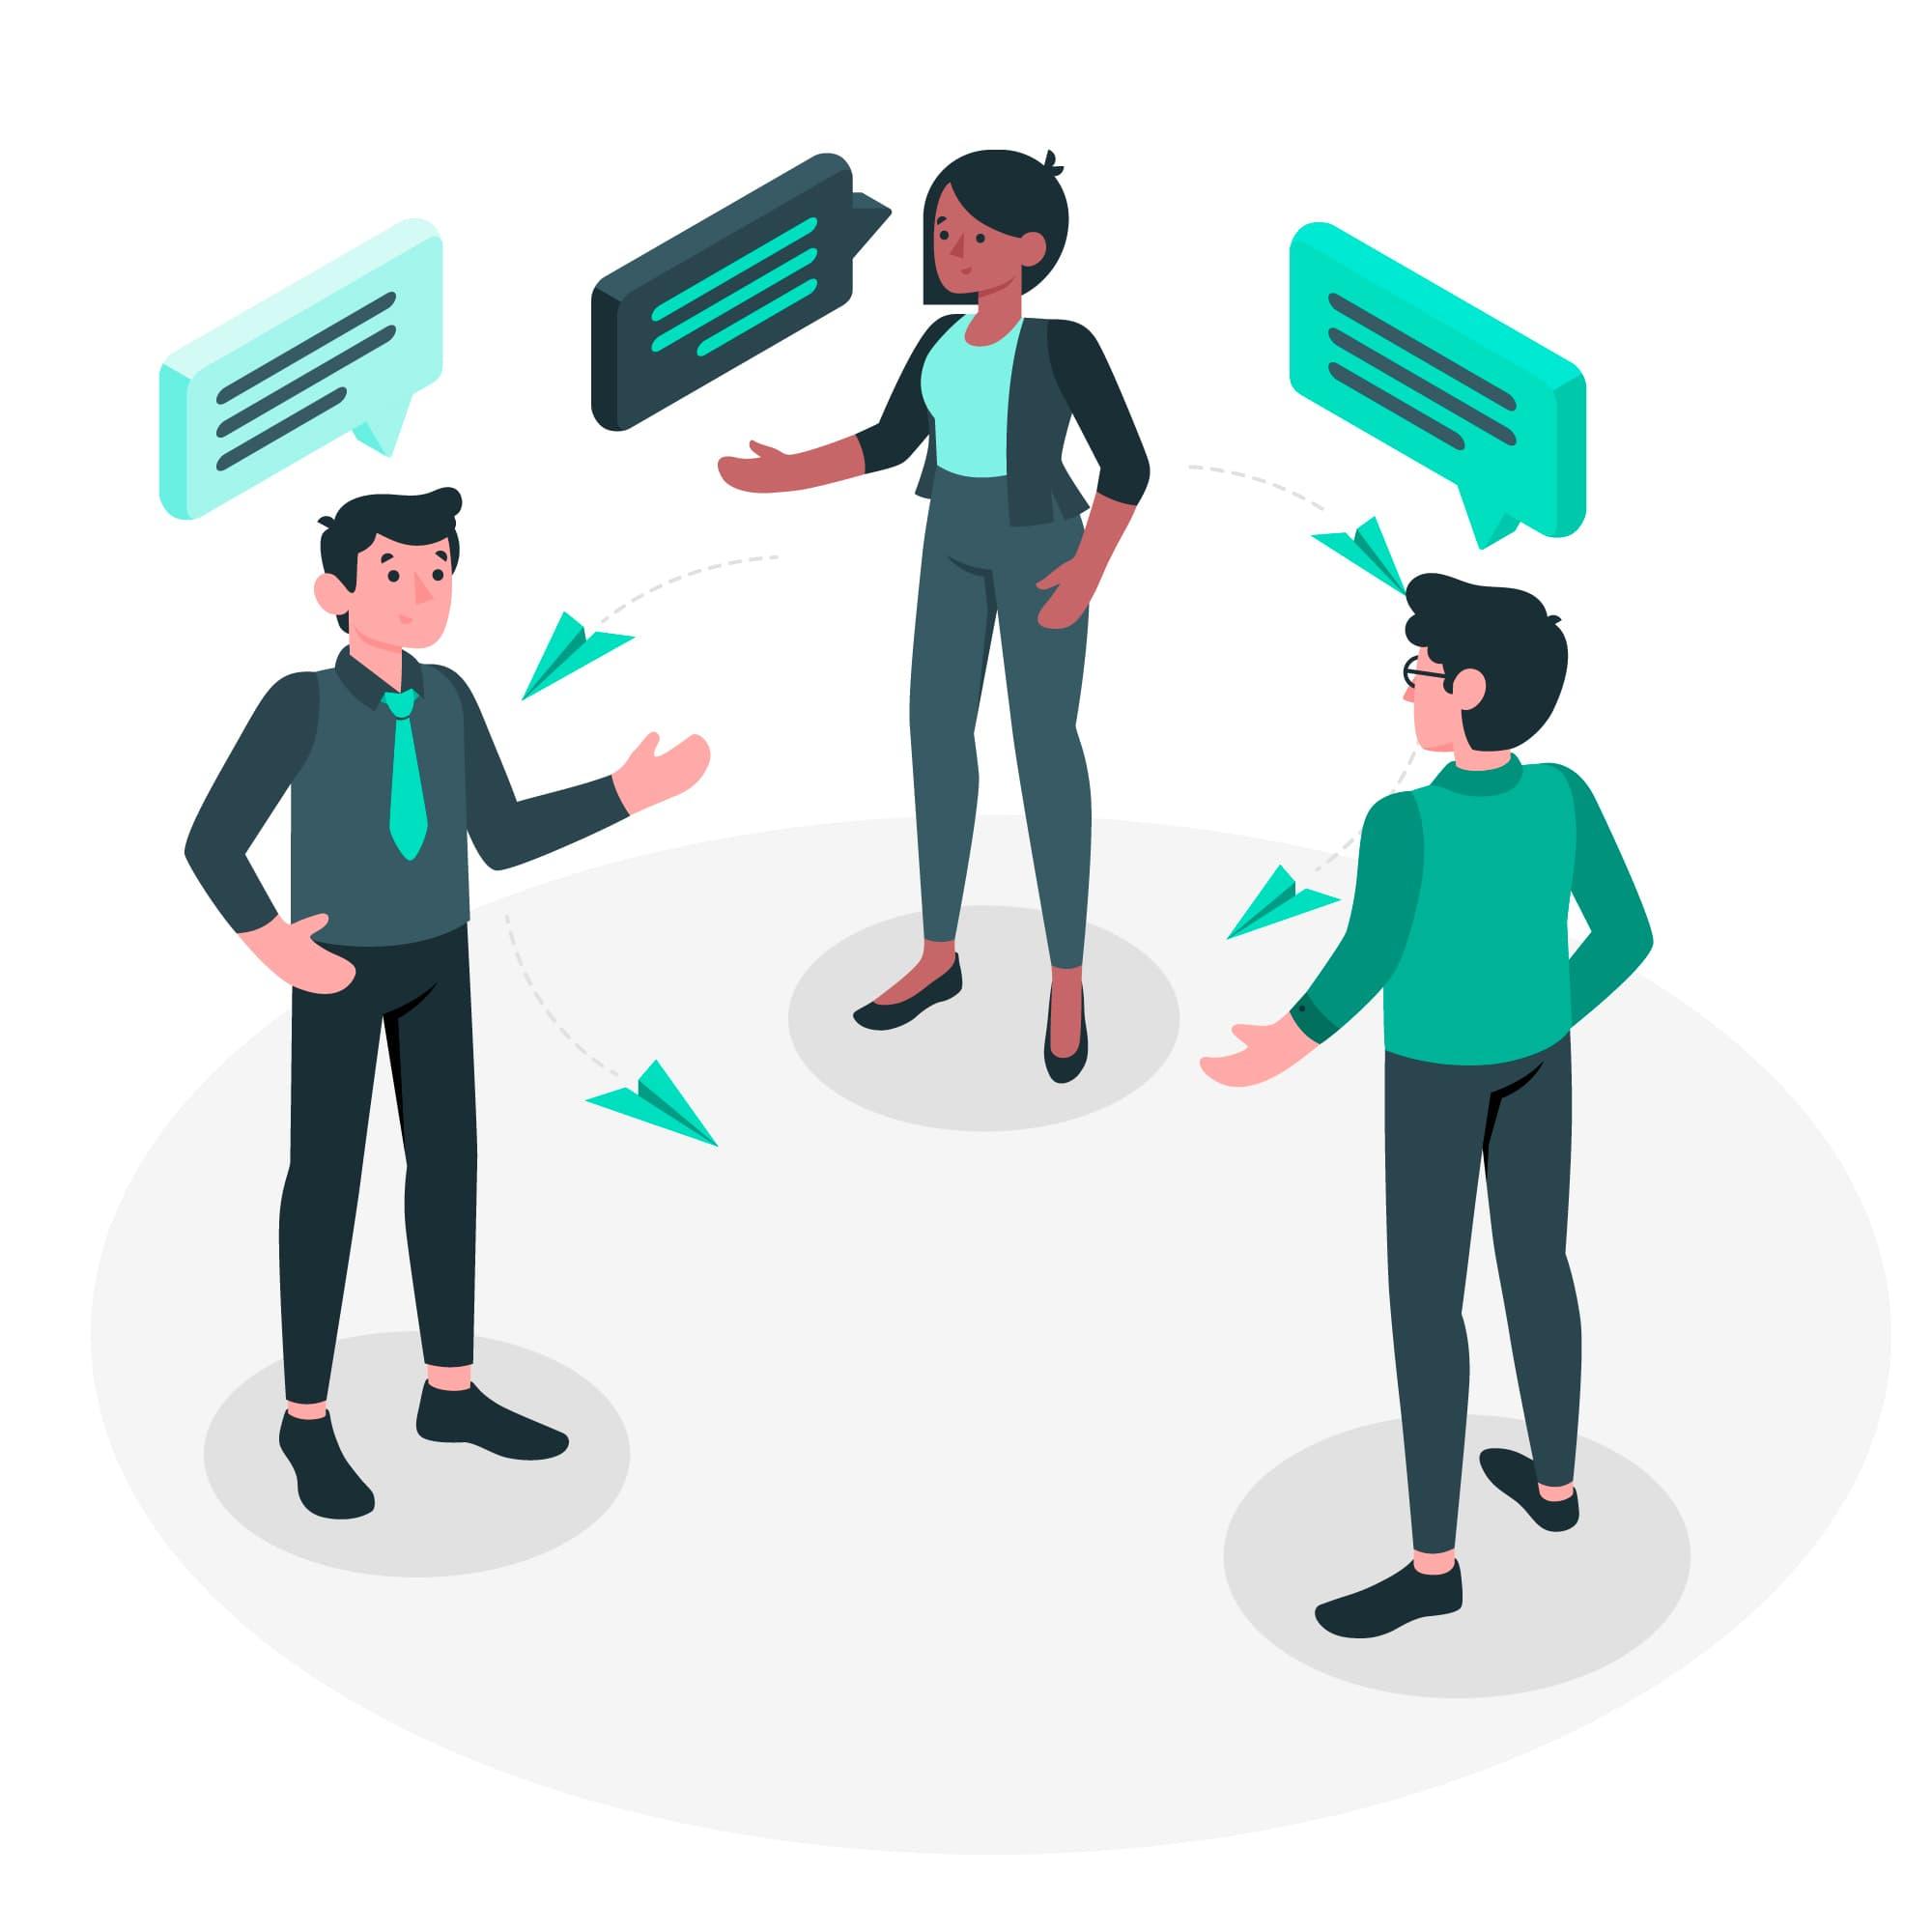 ITエンジニアにコミュニケーション能力って必要?の答え